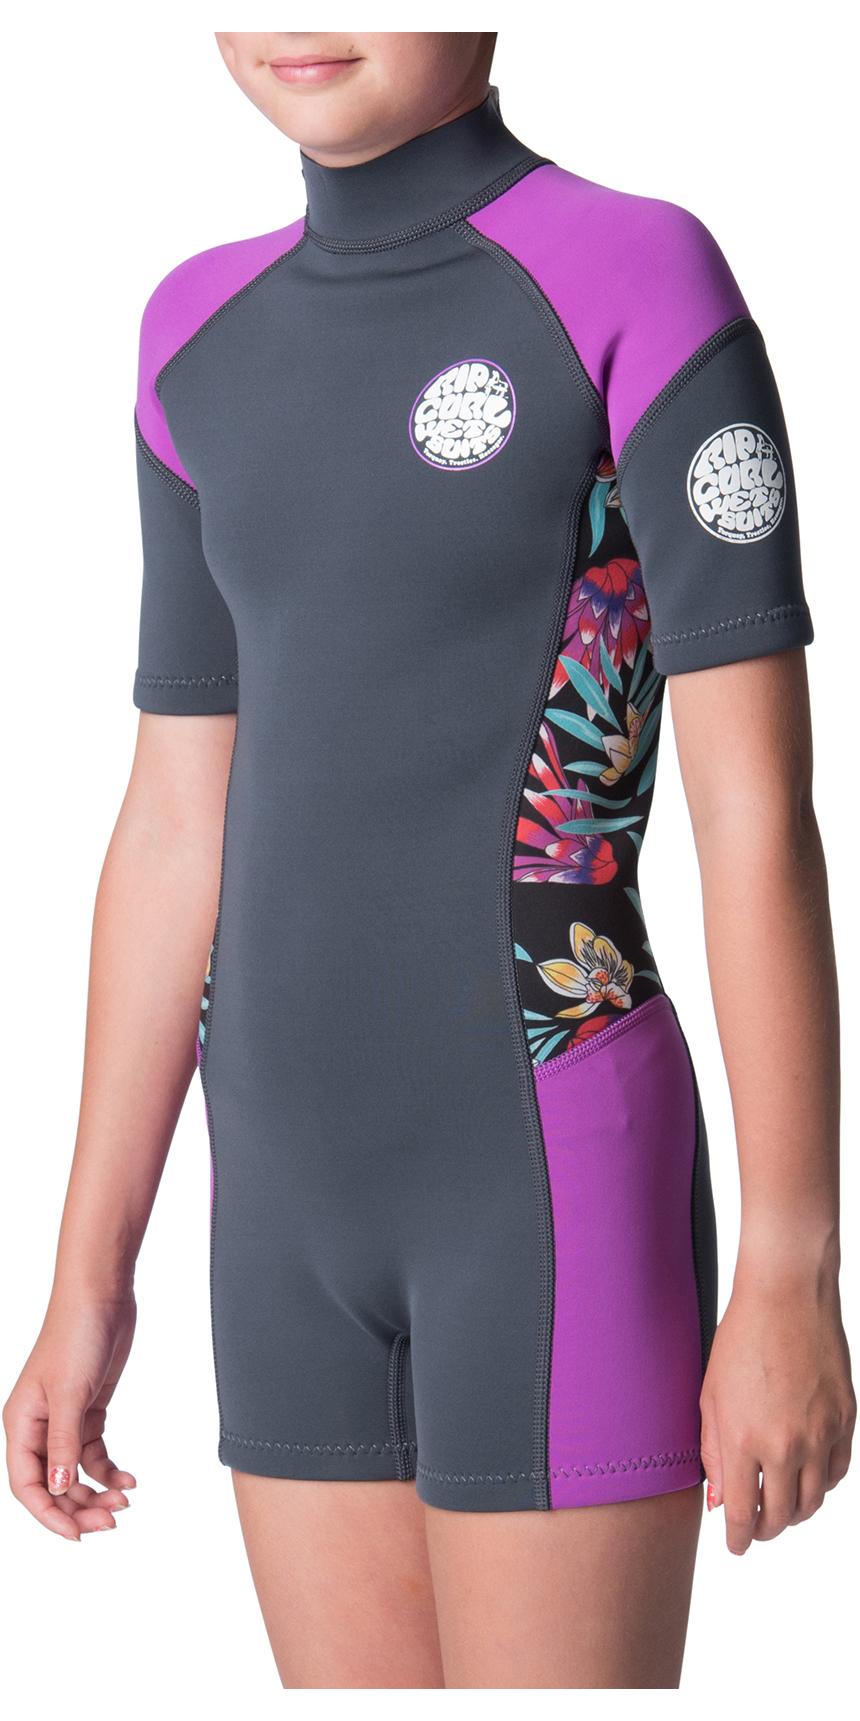 2019 Rip Curl Junior Girls Dawn Patrol Spring Shorty Wetsuit Purple WSP8BJ